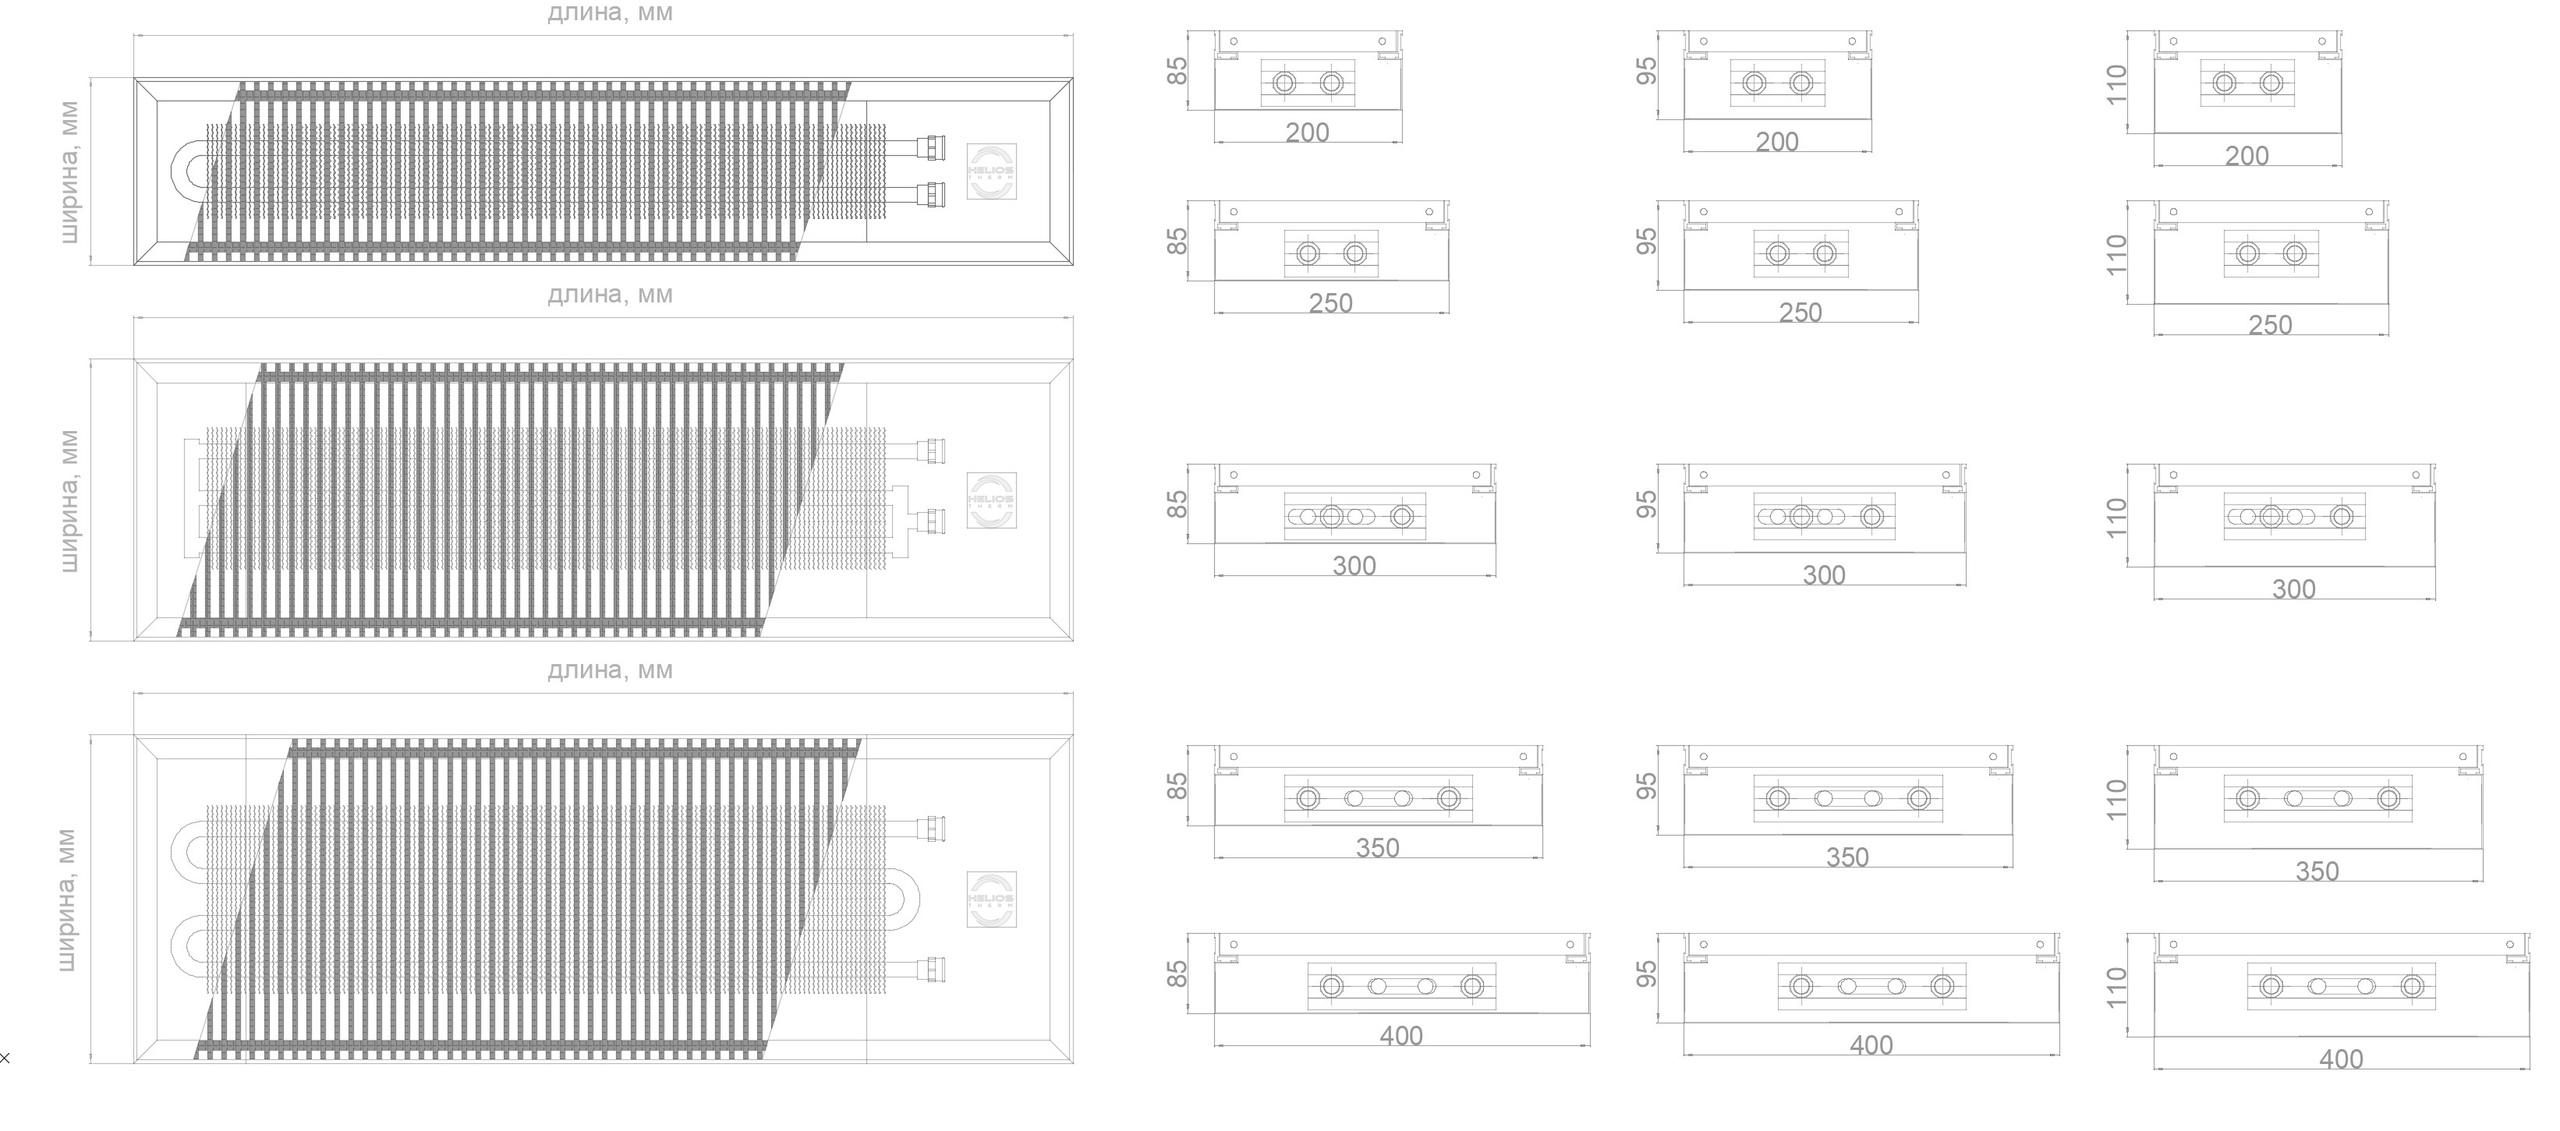 Схема конвектора CIA шириной 200 мм, 250 мм, 300 мм